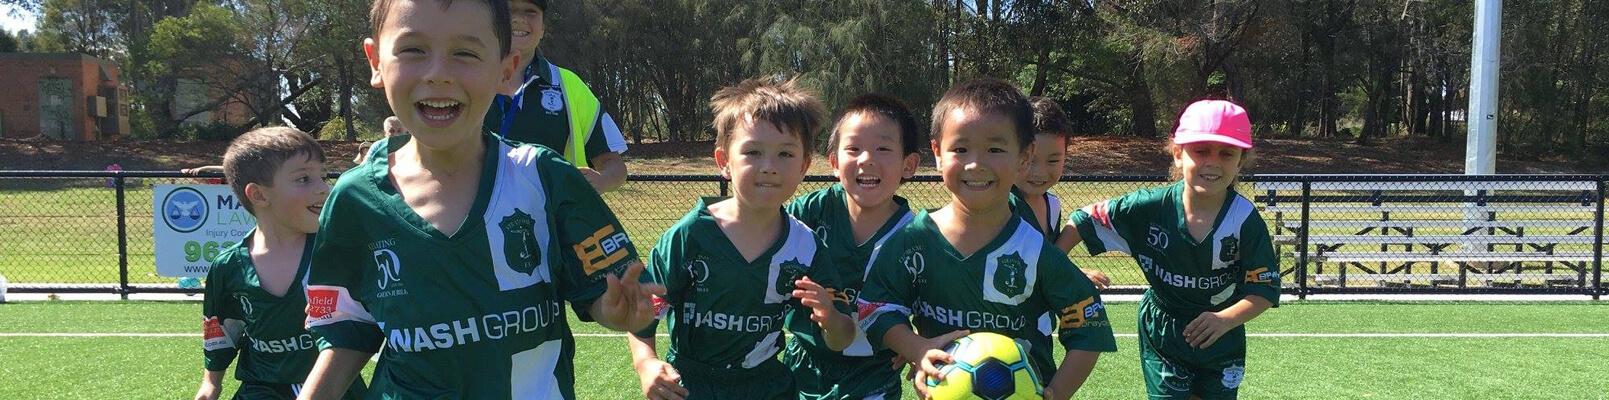 Strathfield Junior Soccer Club